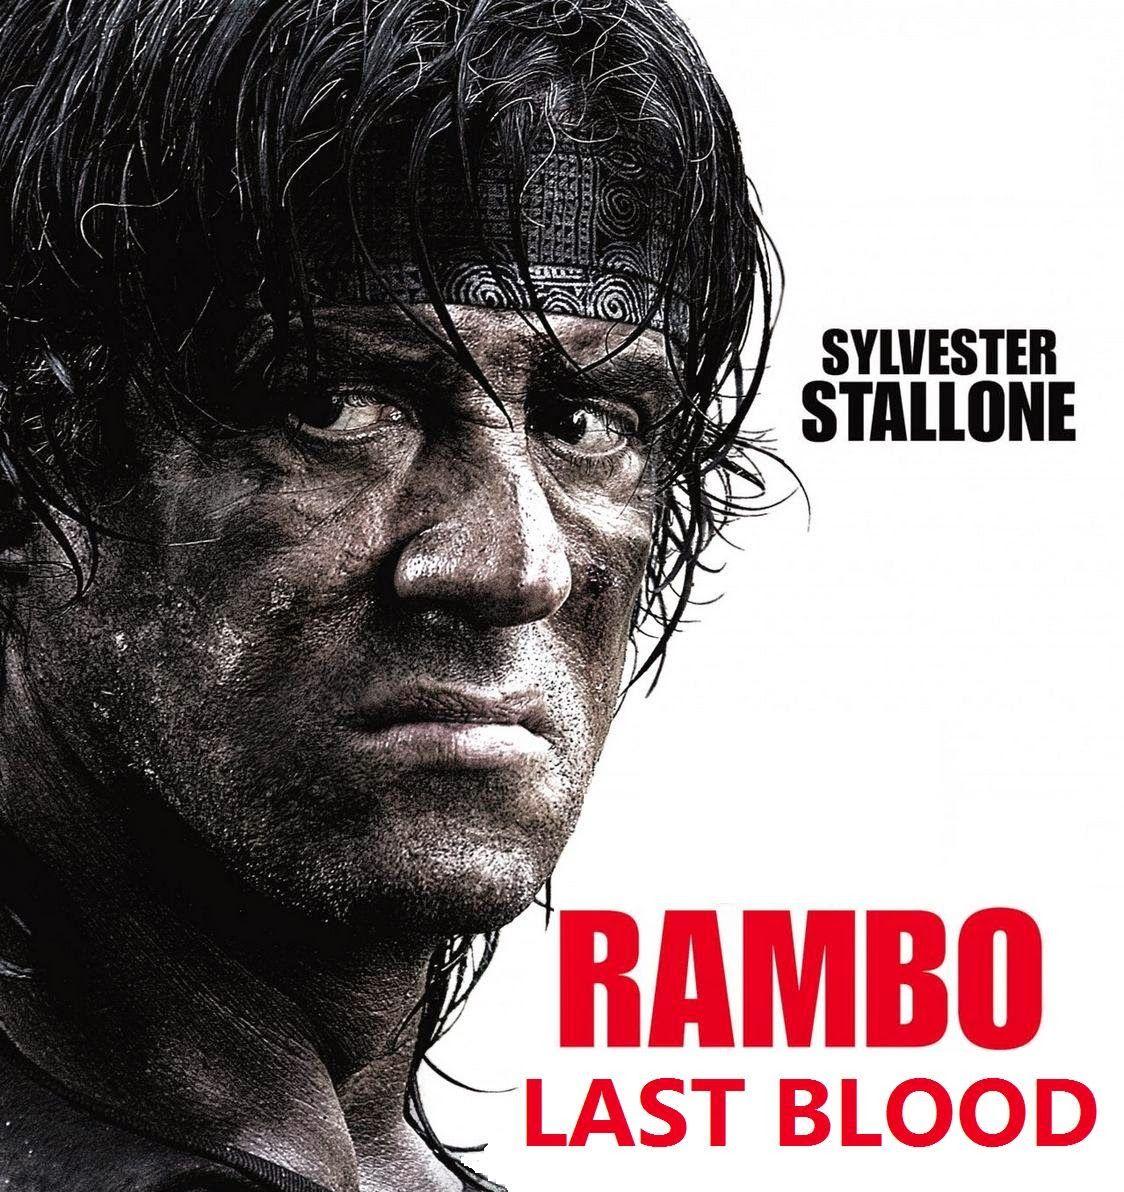 Rambo V Kini Rambo Hanya Jago Kandang Kompasiana Com